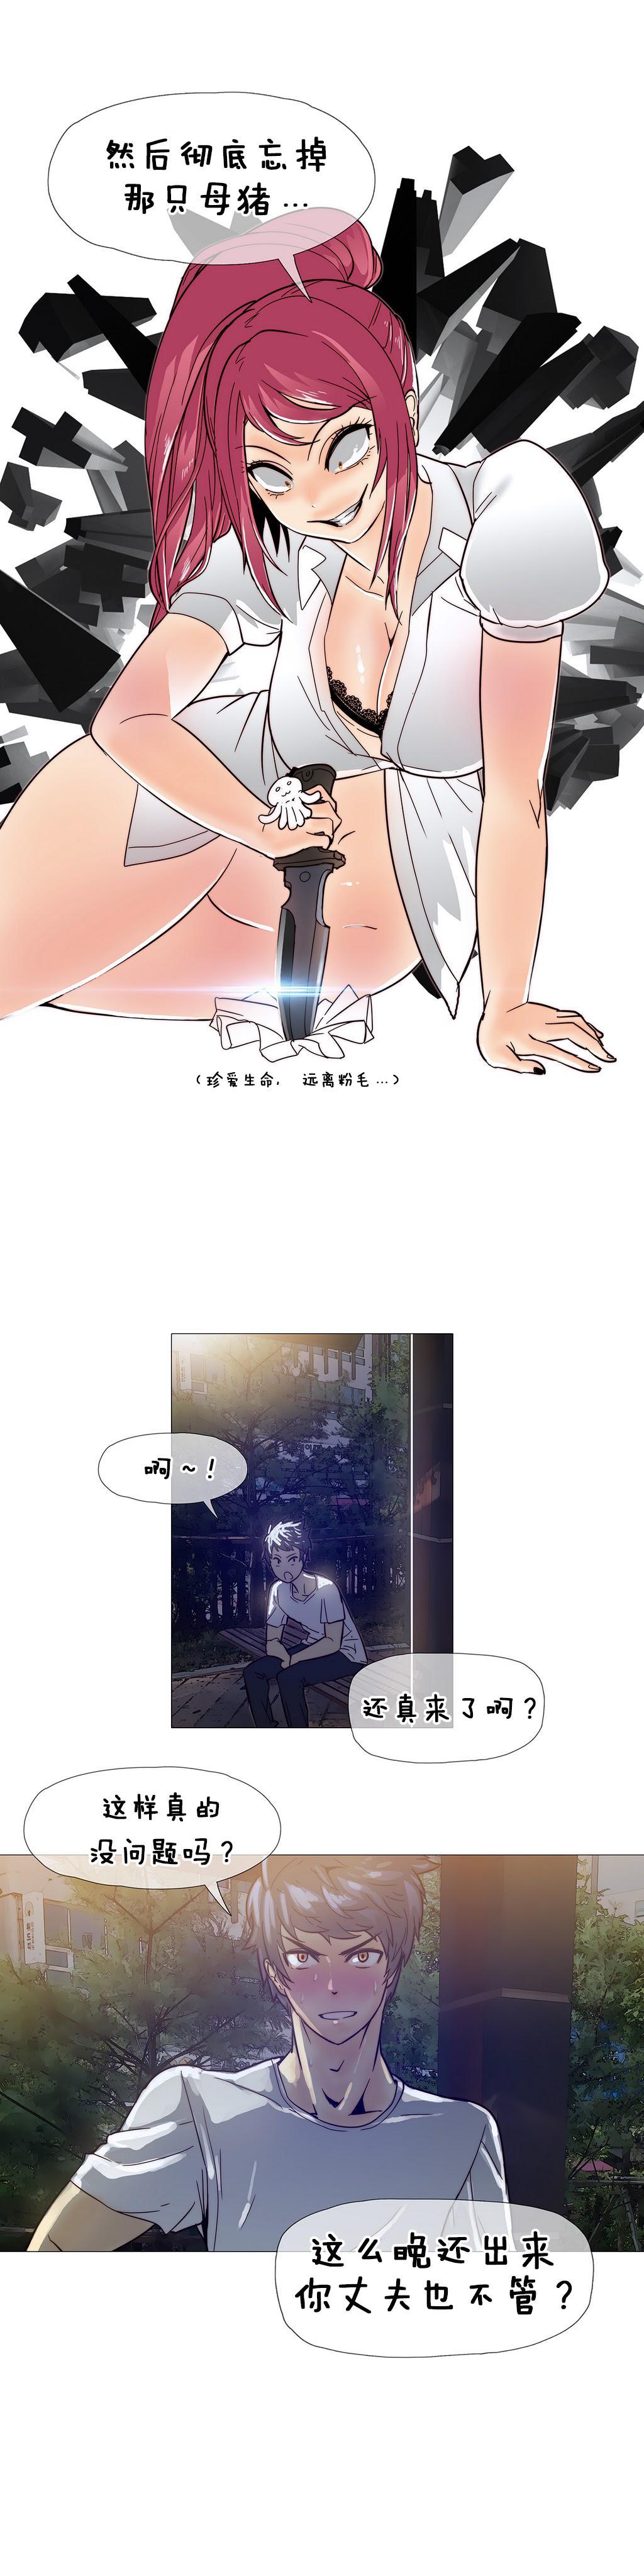 HouseHold Affairs 【卞赤鲤个人汉化】1~21话(持续更新中) 169